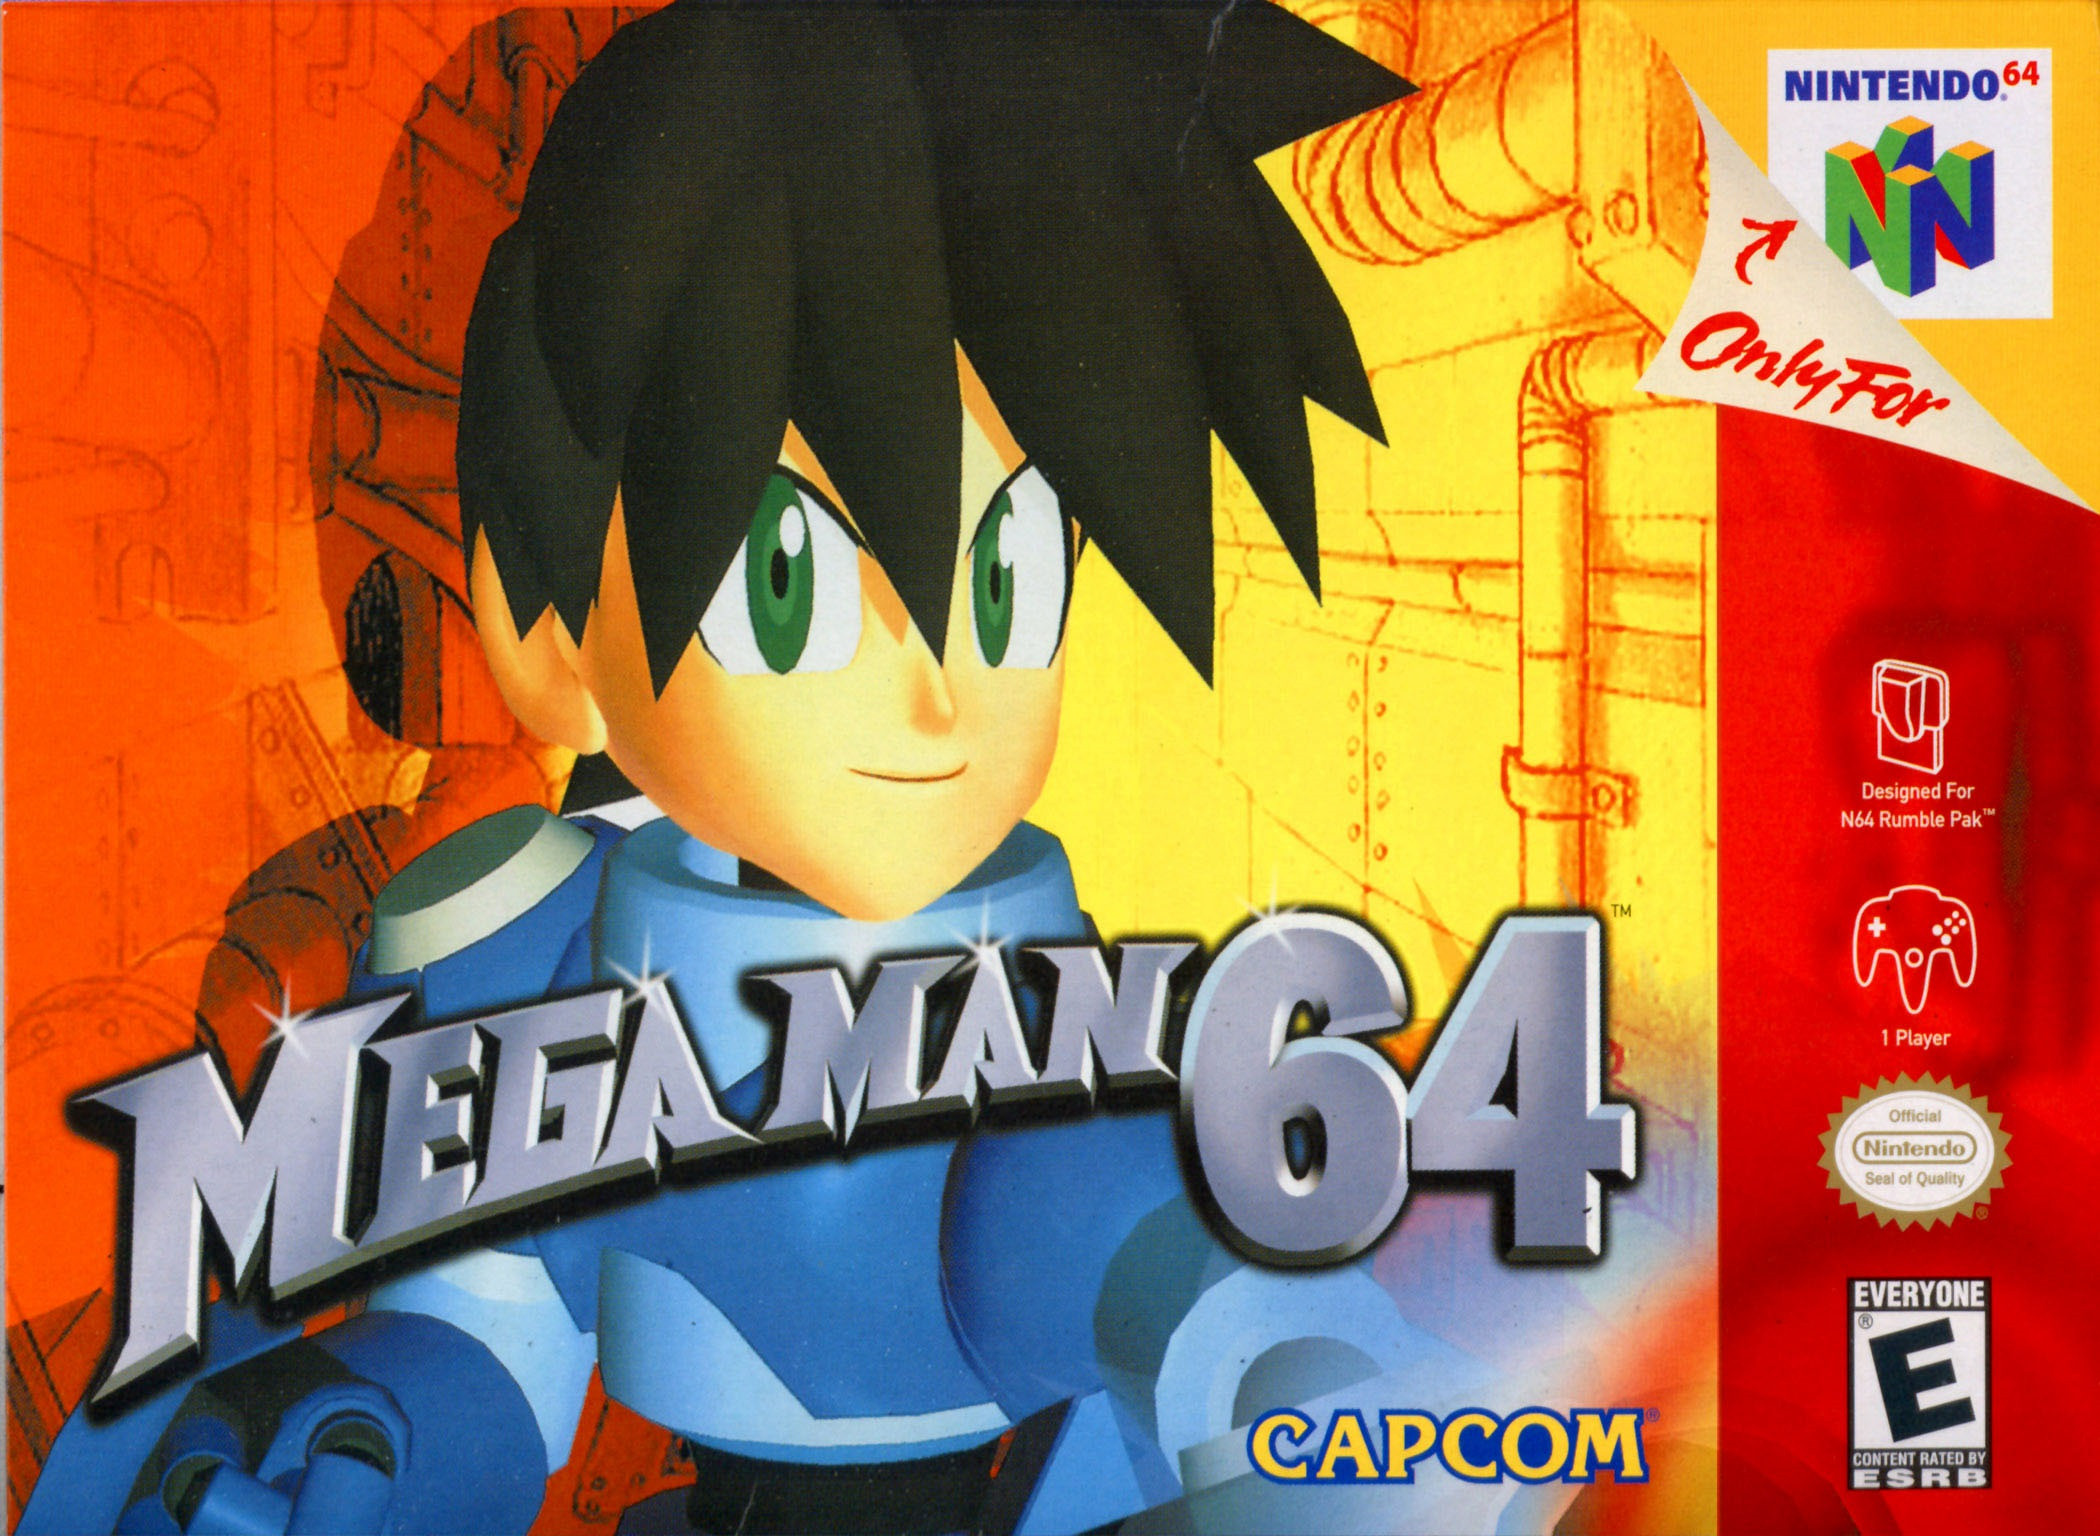 File:MegaMan64.jpg